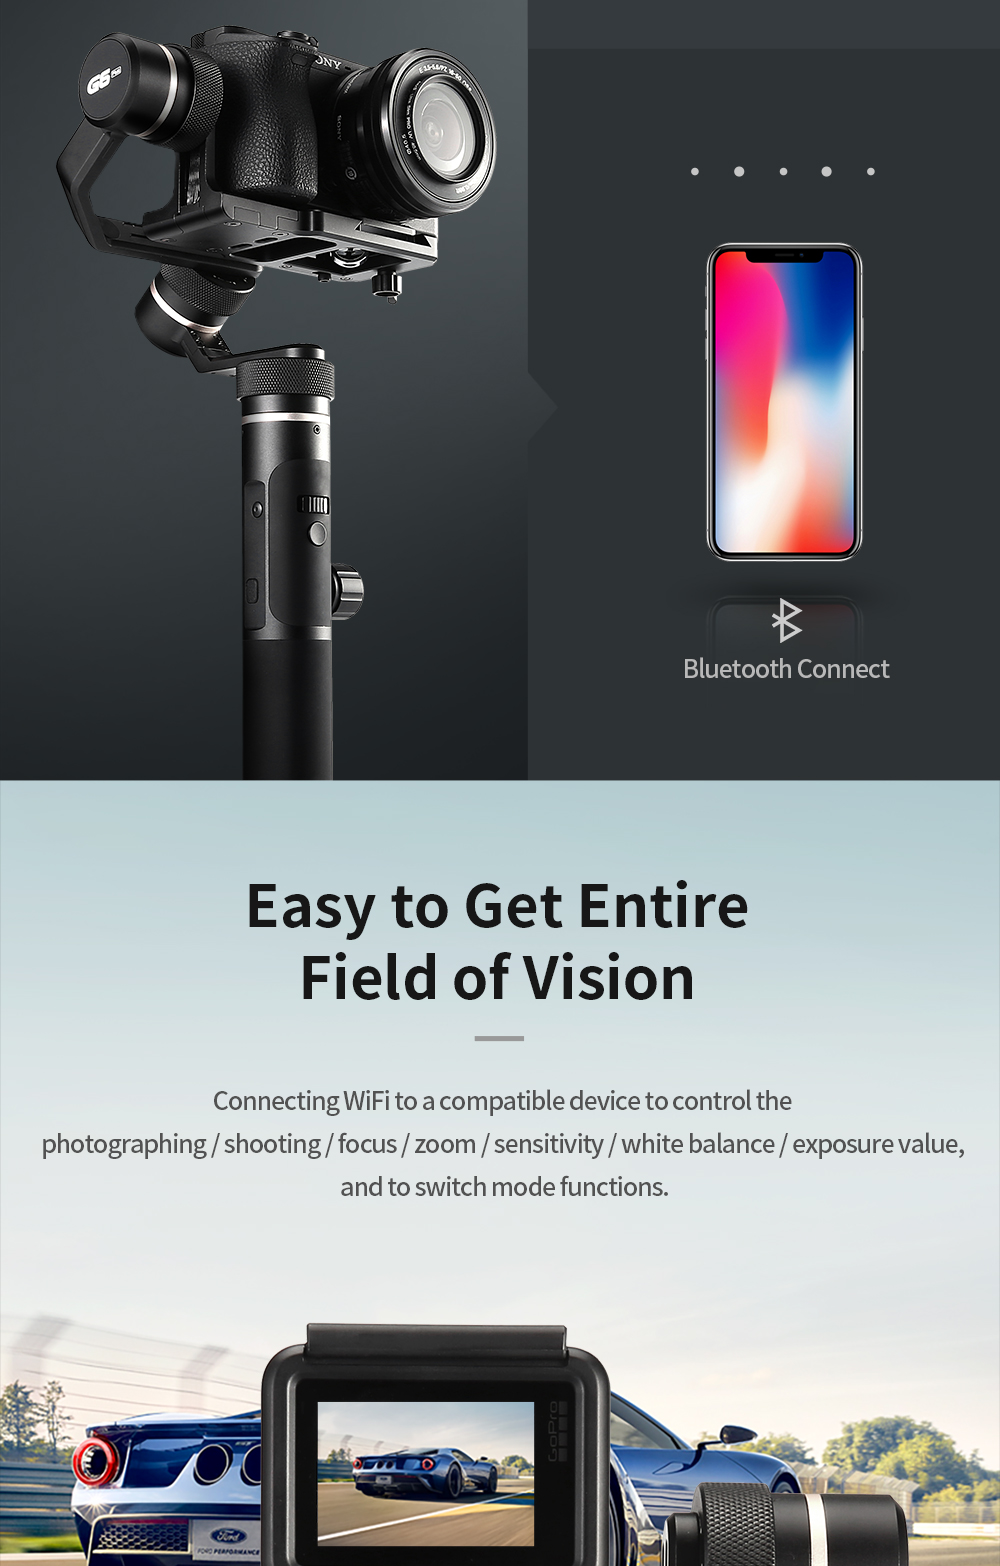 FeiyuTech G6 Plus 3-Axis Handheld Gimbal Stabilizer for Mirrorless Camera Pocket Camera GoPro Smartphone Payload 800g Feiyu G6P 5